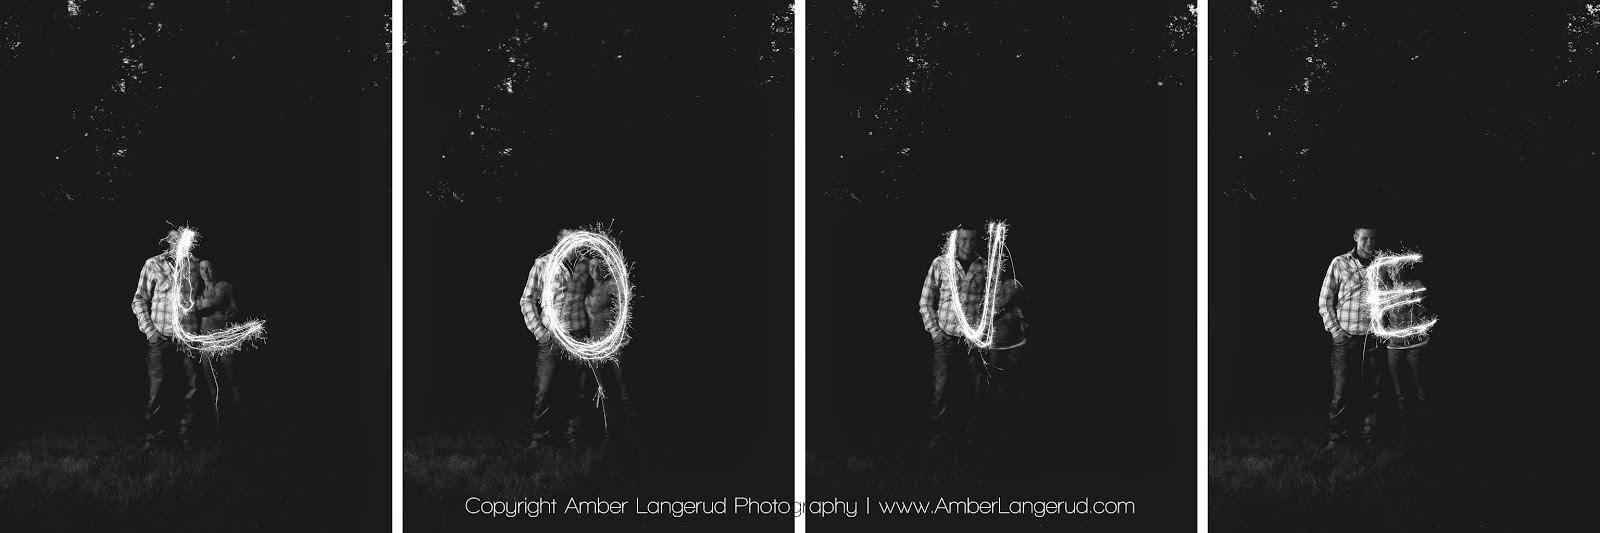 Sparkler engagement pictures   Detroit Lakes Area Photographer   Amber Langerud Photography